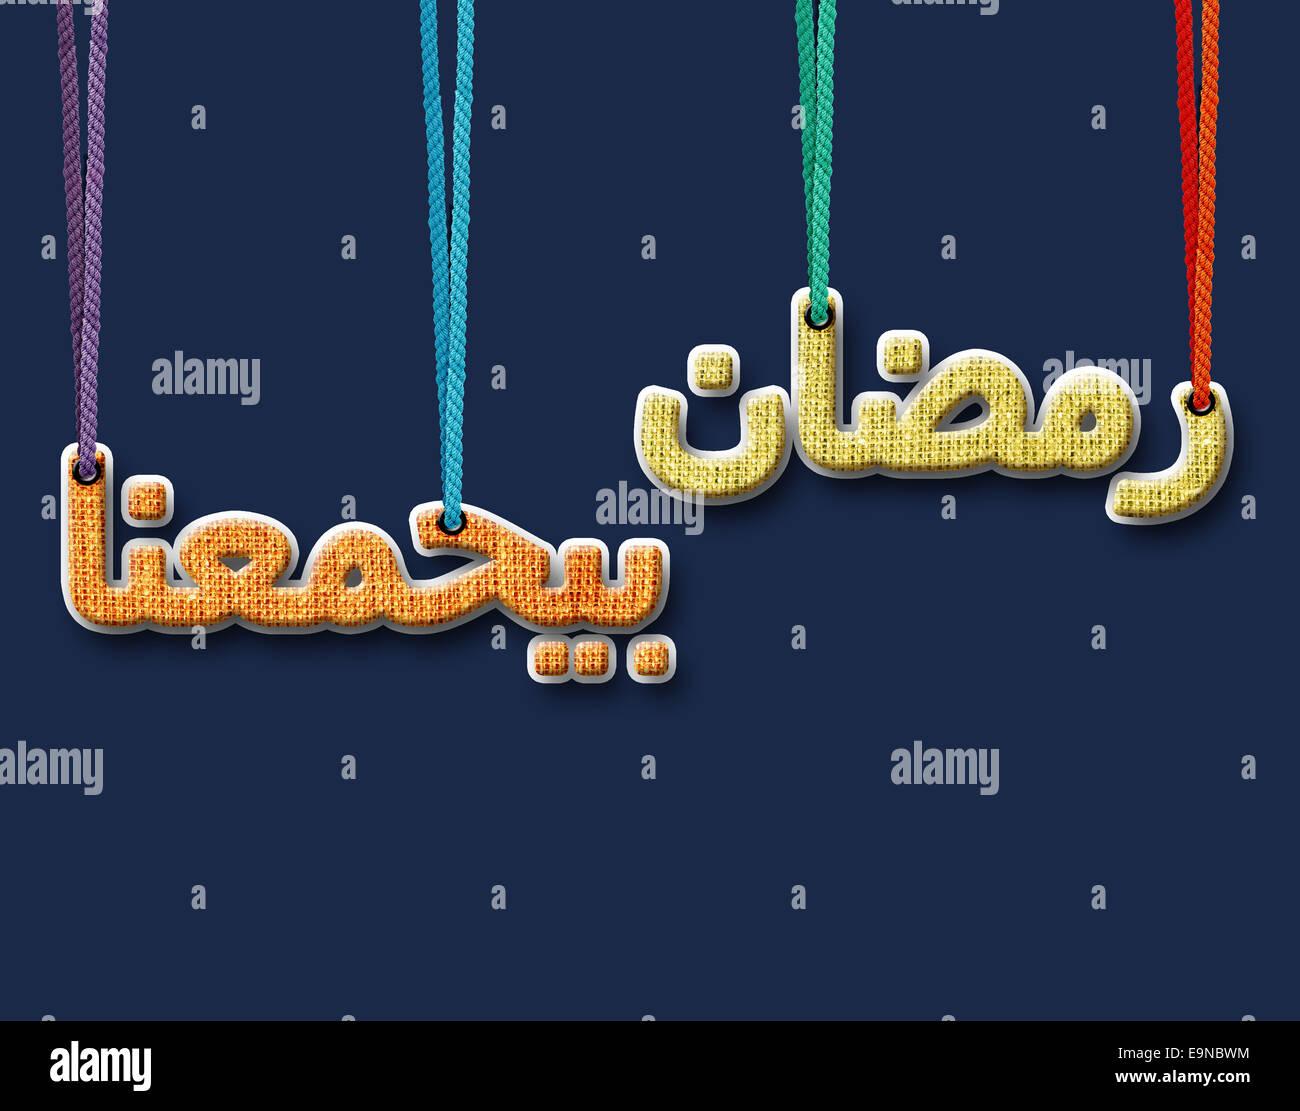 Ramadan and eid al fitr greeting card stock photo 74843712 alamy ramadan and eid al fitr greeting card m4hsunfo